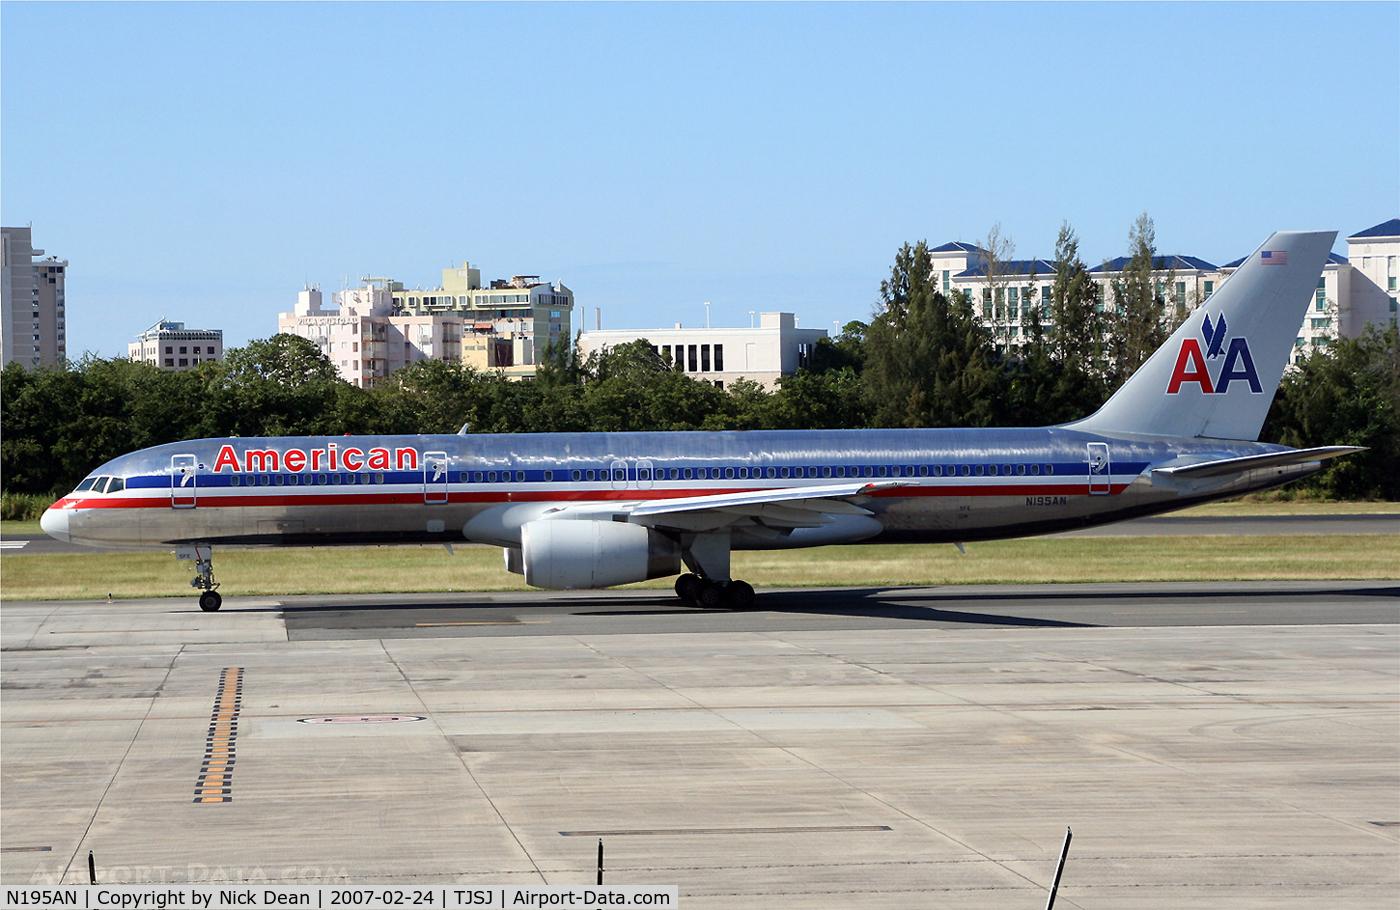 N195AN, 2001 Boeing 757-223 C/N 32389, /